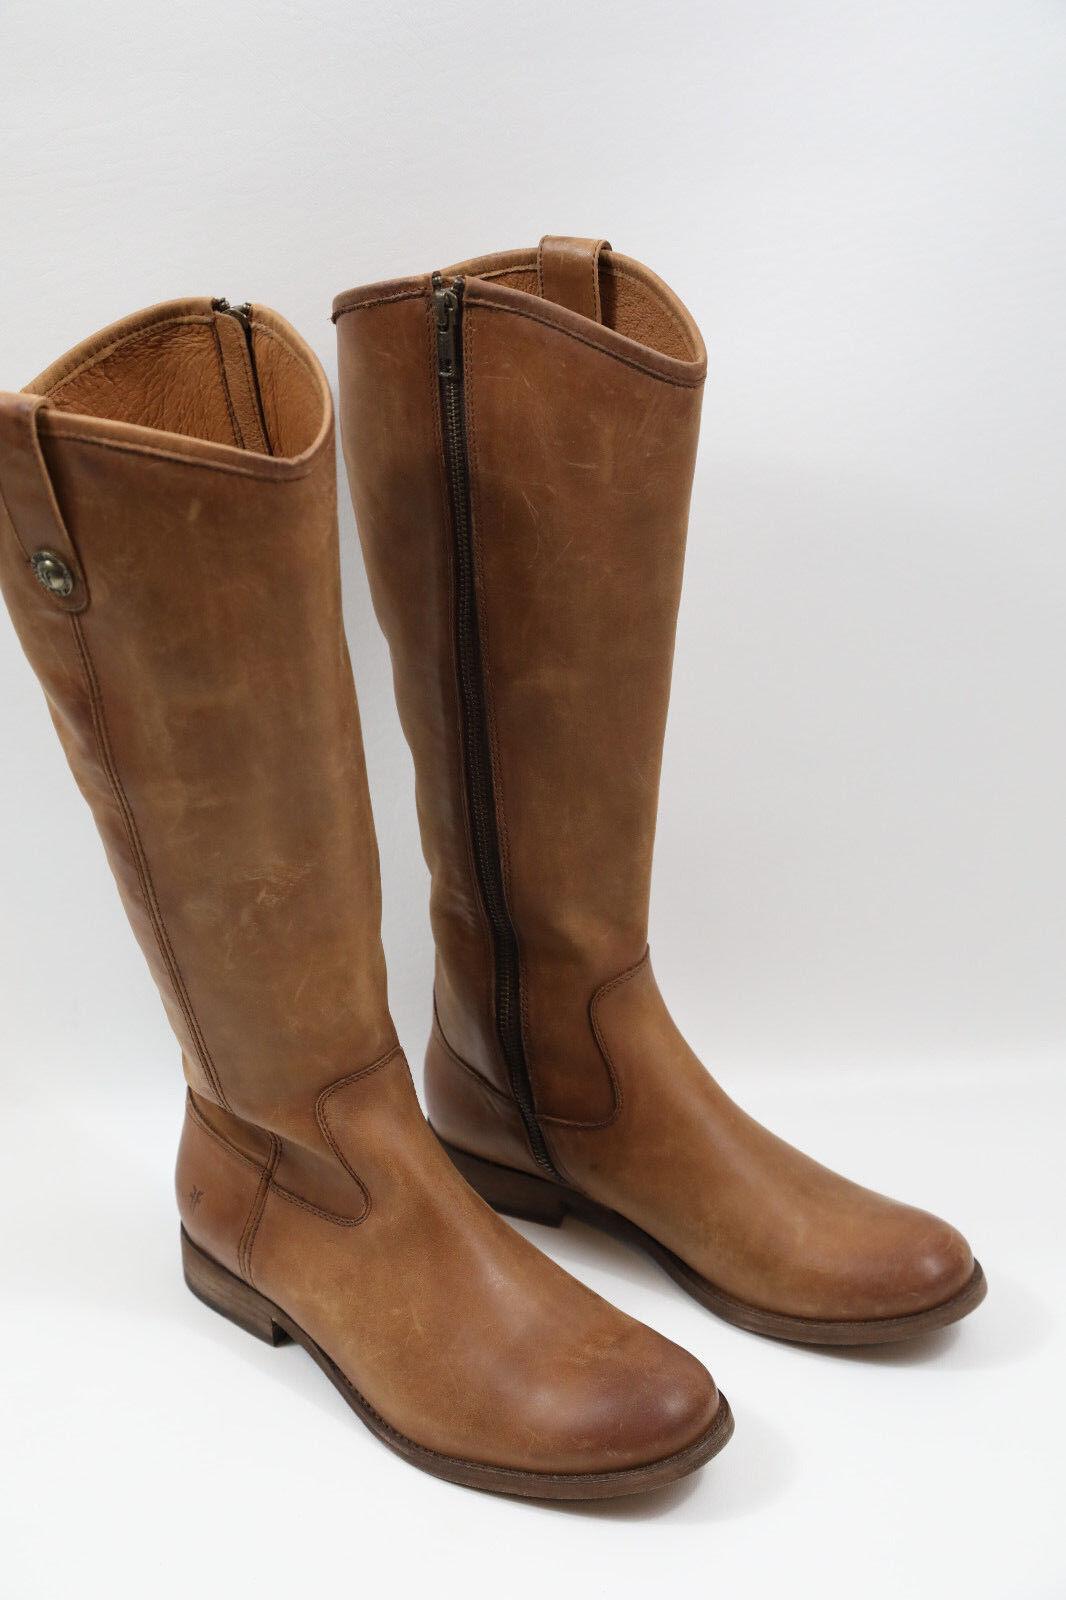 10 FRYE Melissa Size Zip Knee High Boots Size 8 M